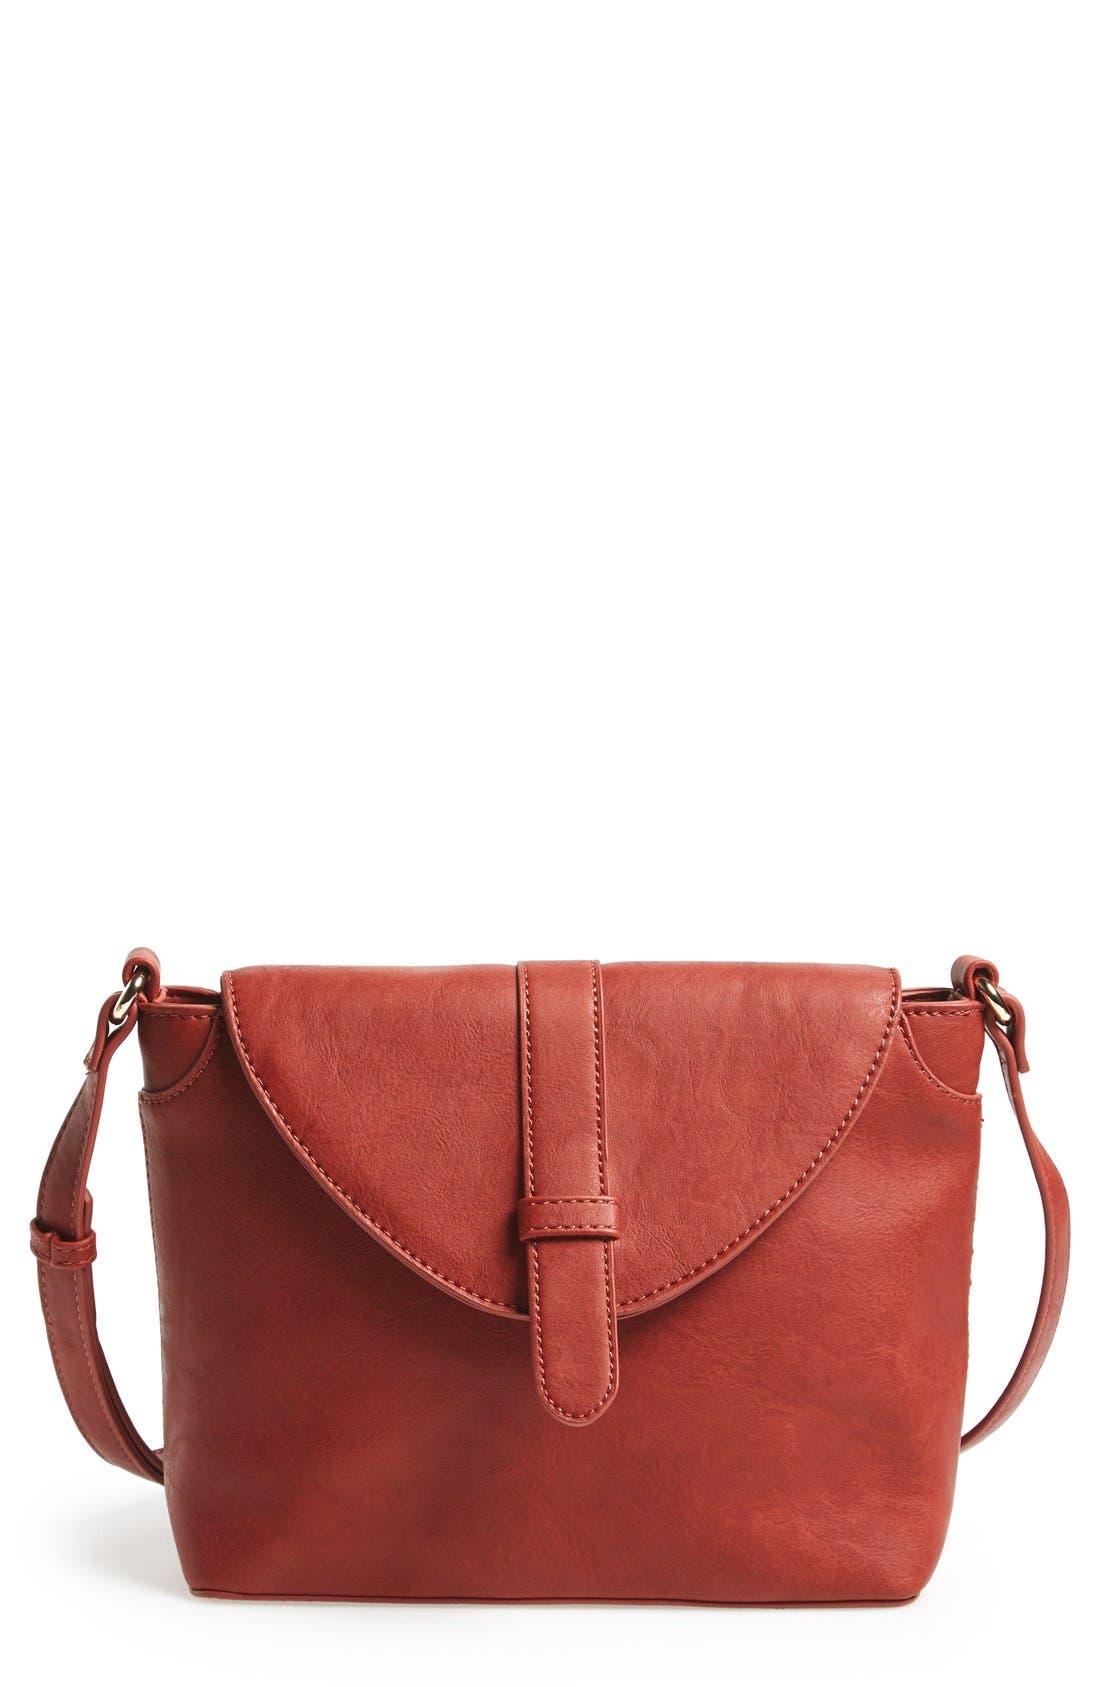 Main Image - Sole Society 'Brady' Faux Leather Crossbody Bag